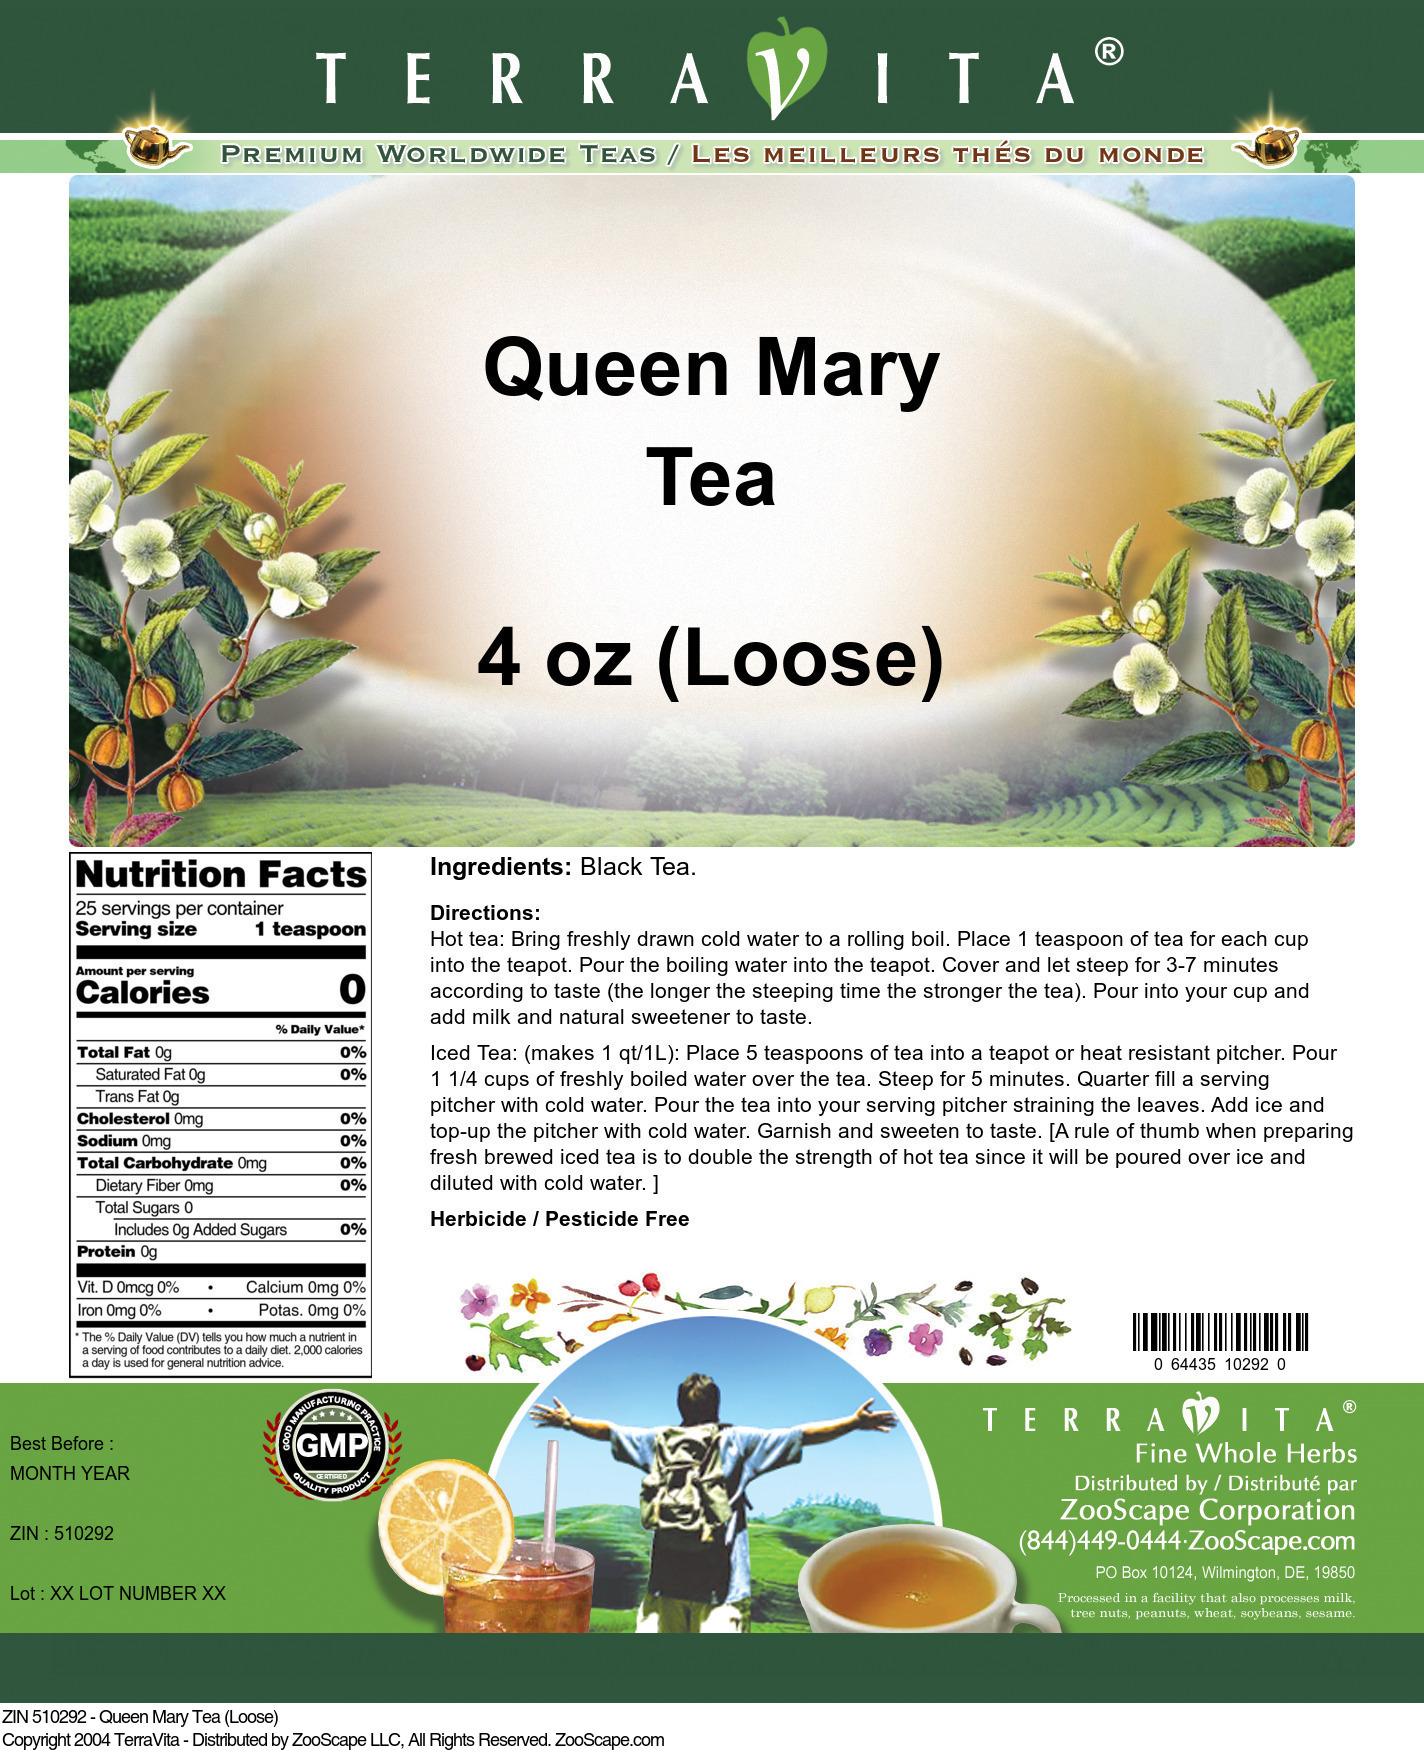 Queen Mary Tea (Loose)